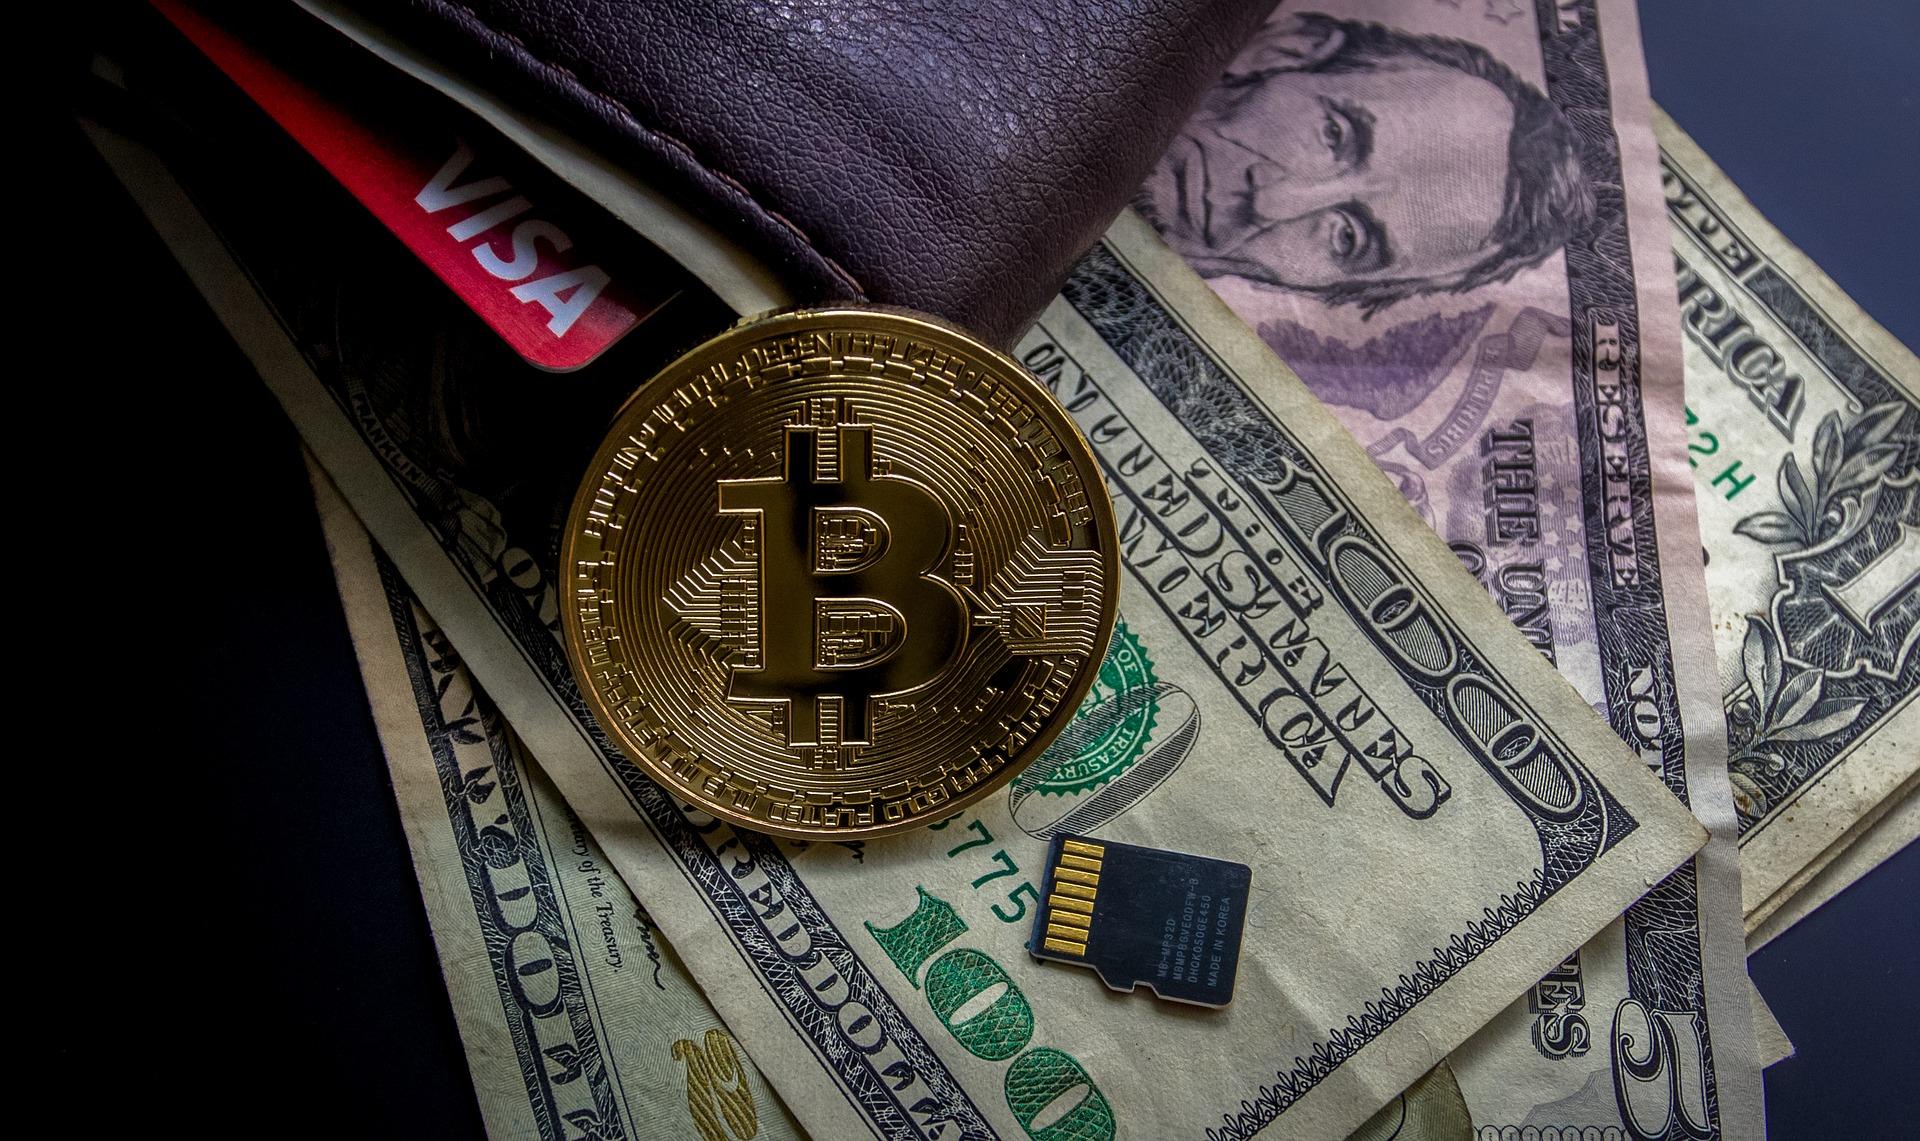 Coinbase lanza su tarjeta de débito Visa para pagos con criptomonedas en Estados Unidos